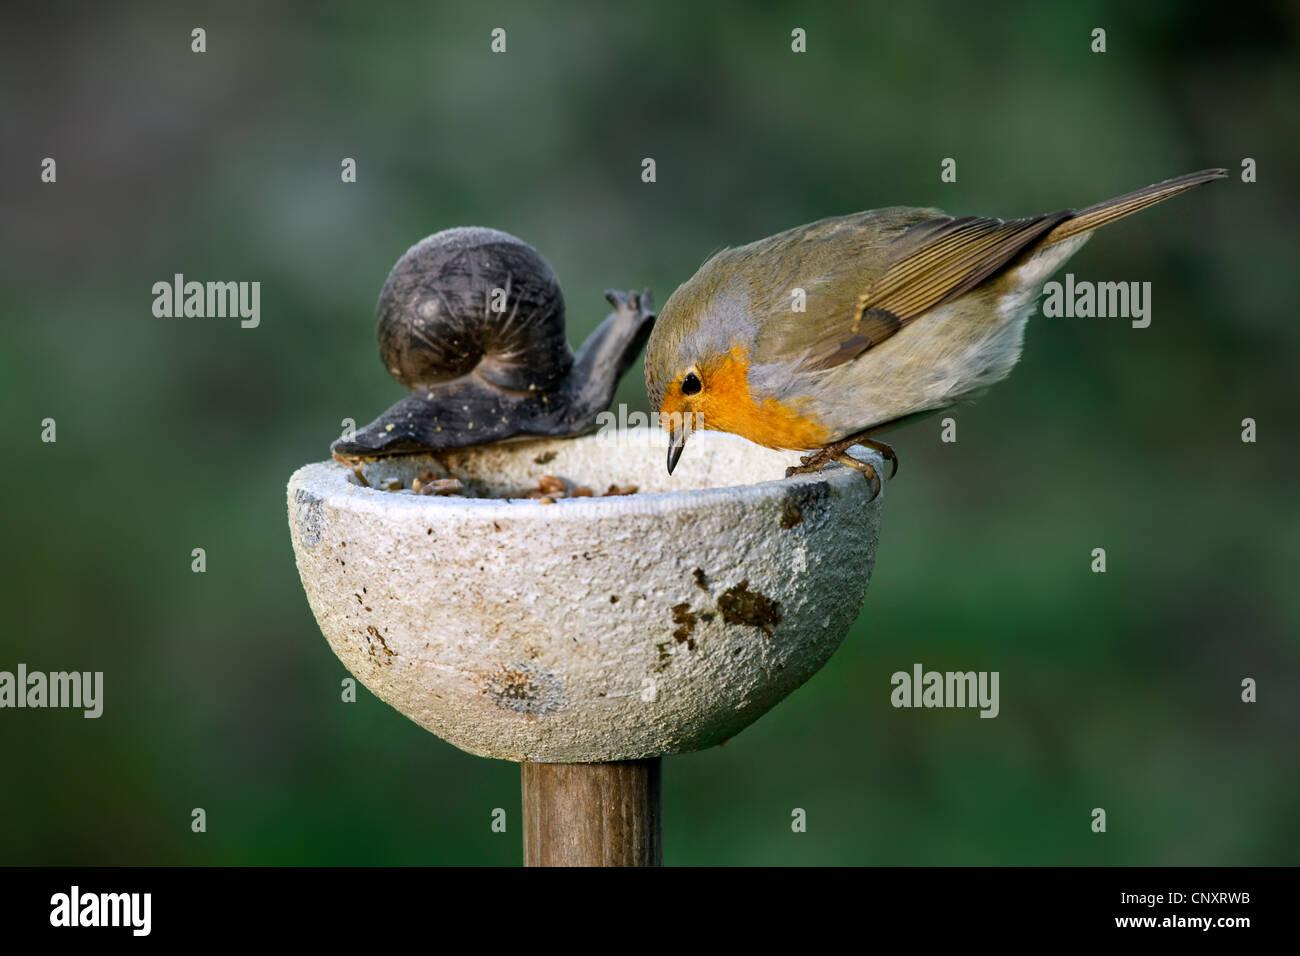 birds feeding bird table stockfotos birds feeding bird. Black Bedroom Furniture Sets. Home Design Ideas